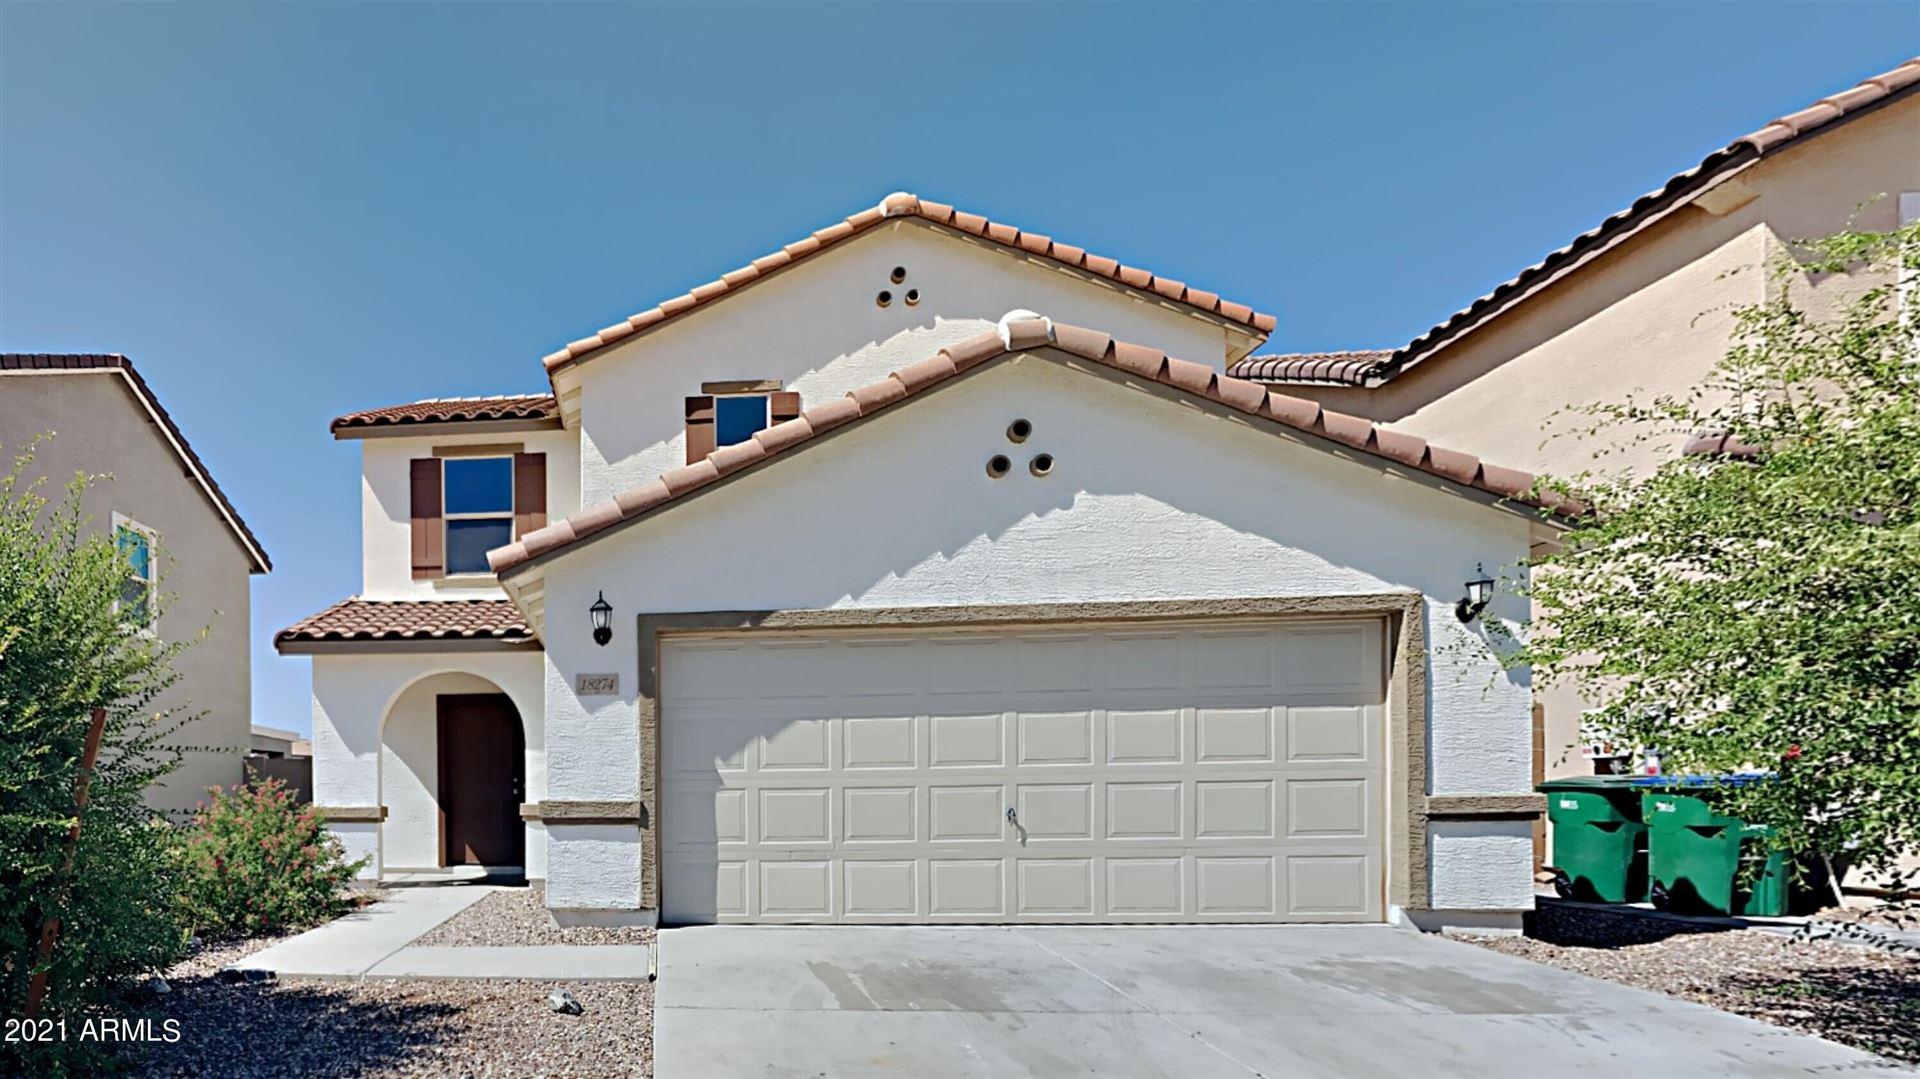 Photo for 18274 N CLARENCE Lane, Maricopa, AZ 85138 (MLS # 6290134)